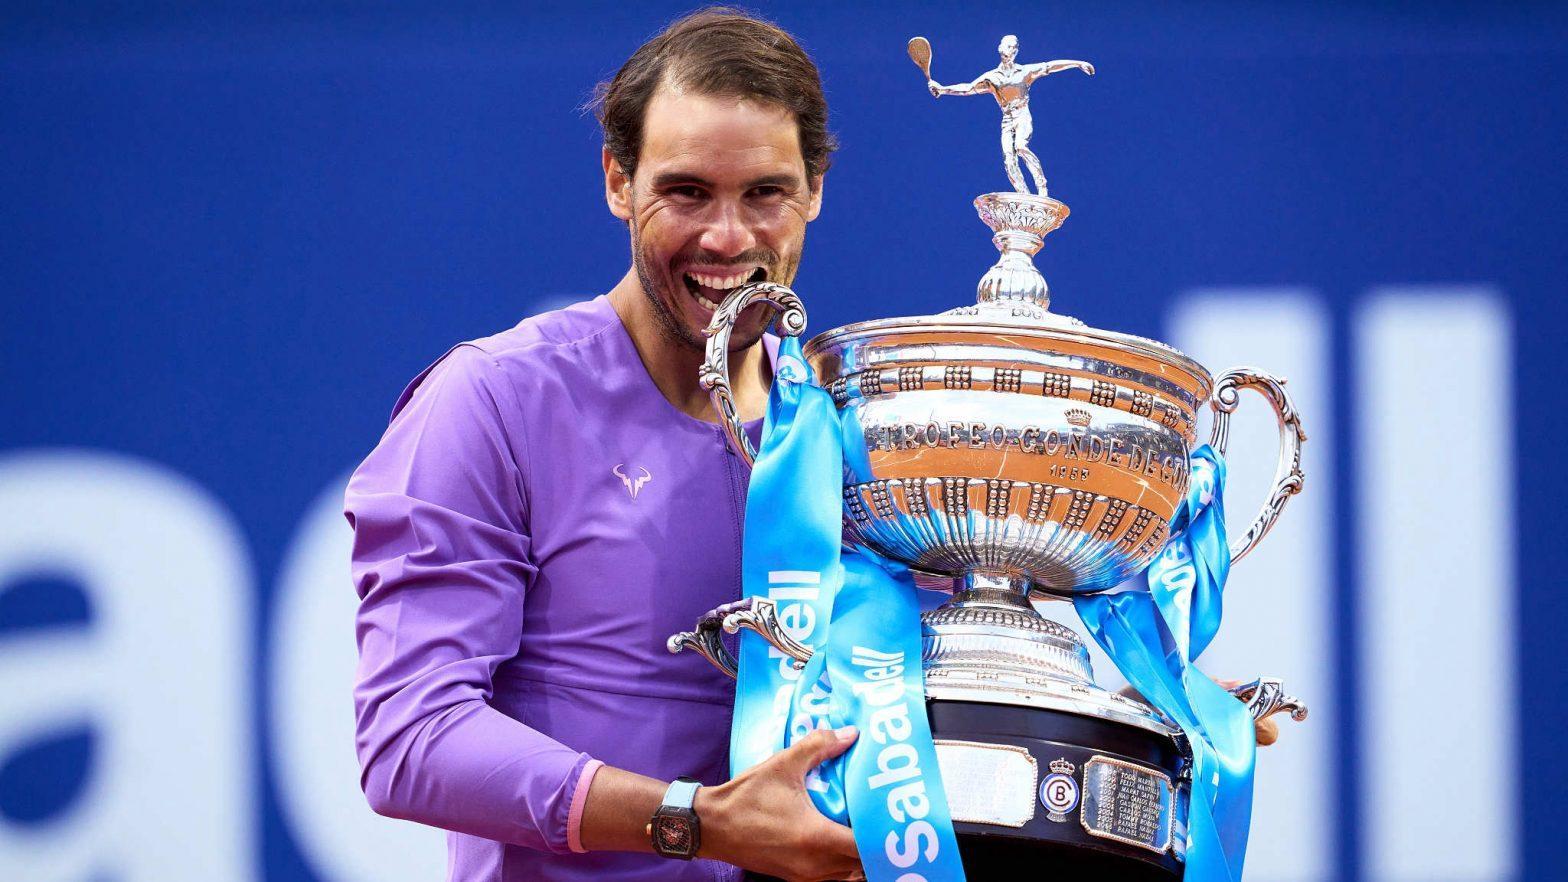 Rafael Nadal clinches 12th Barcelona Open title   রাফেল নাদাল দ্বাদশ বার্সেলোনা ওপেন শিরোপা জিতেছে_40.1